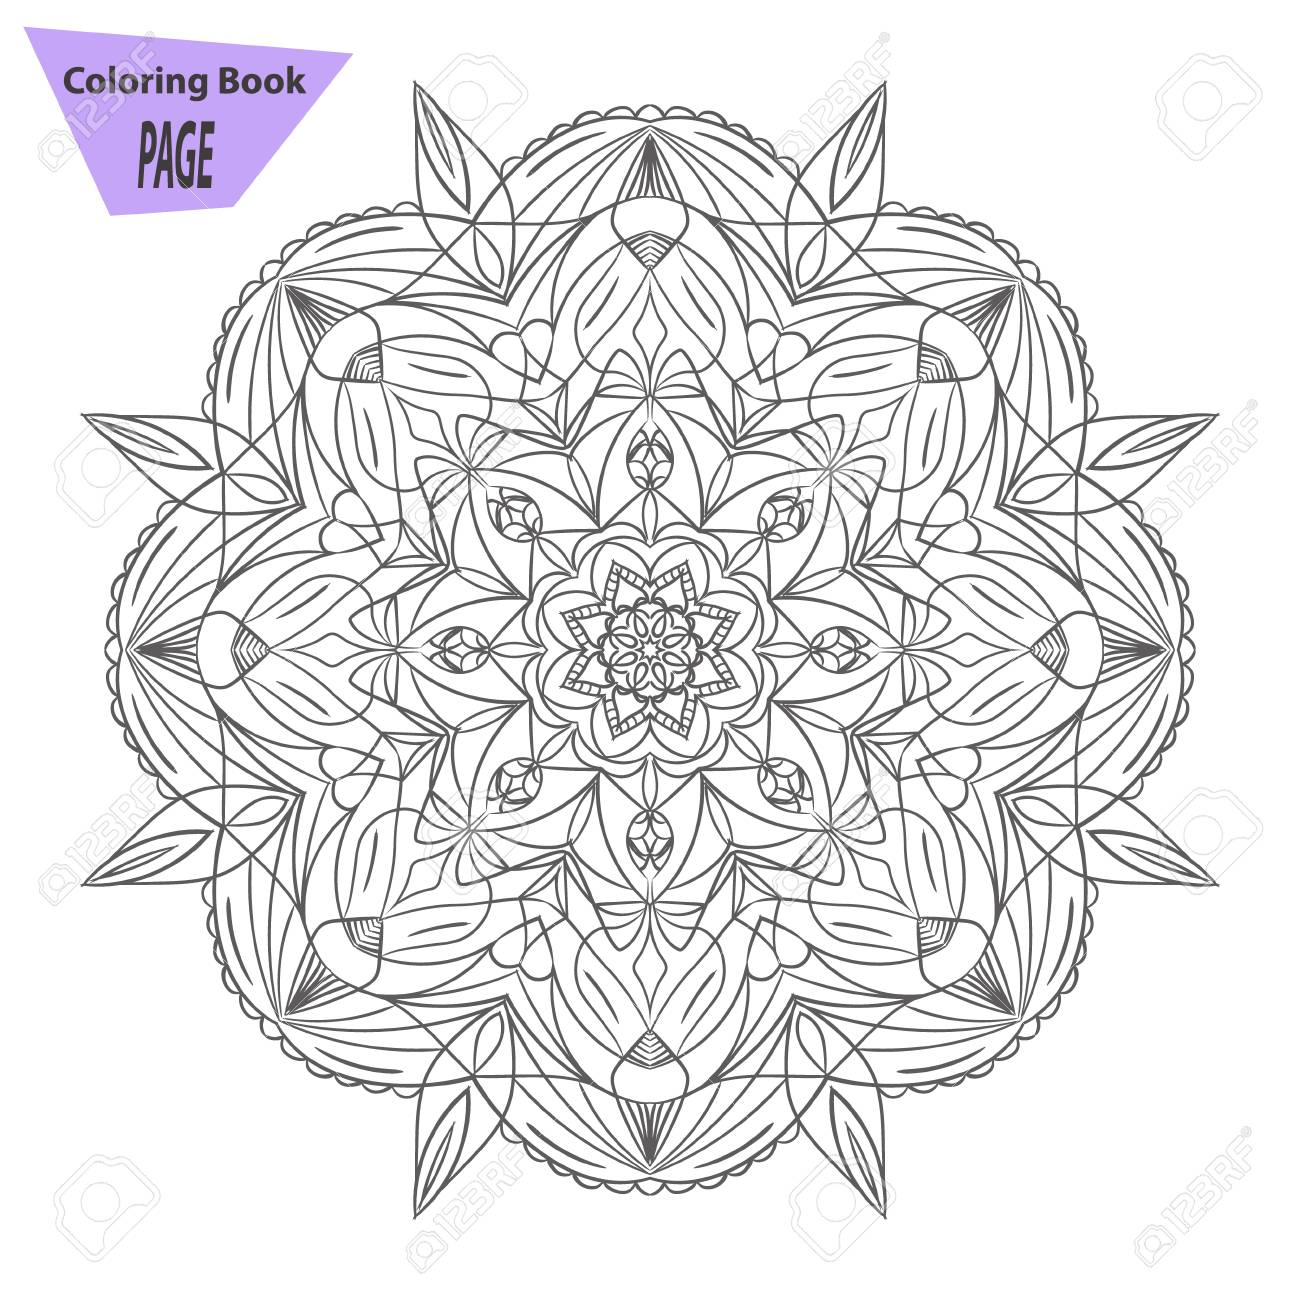 Mandala. Dibujo Para Colorear. Antiguos Elementos Decorativos